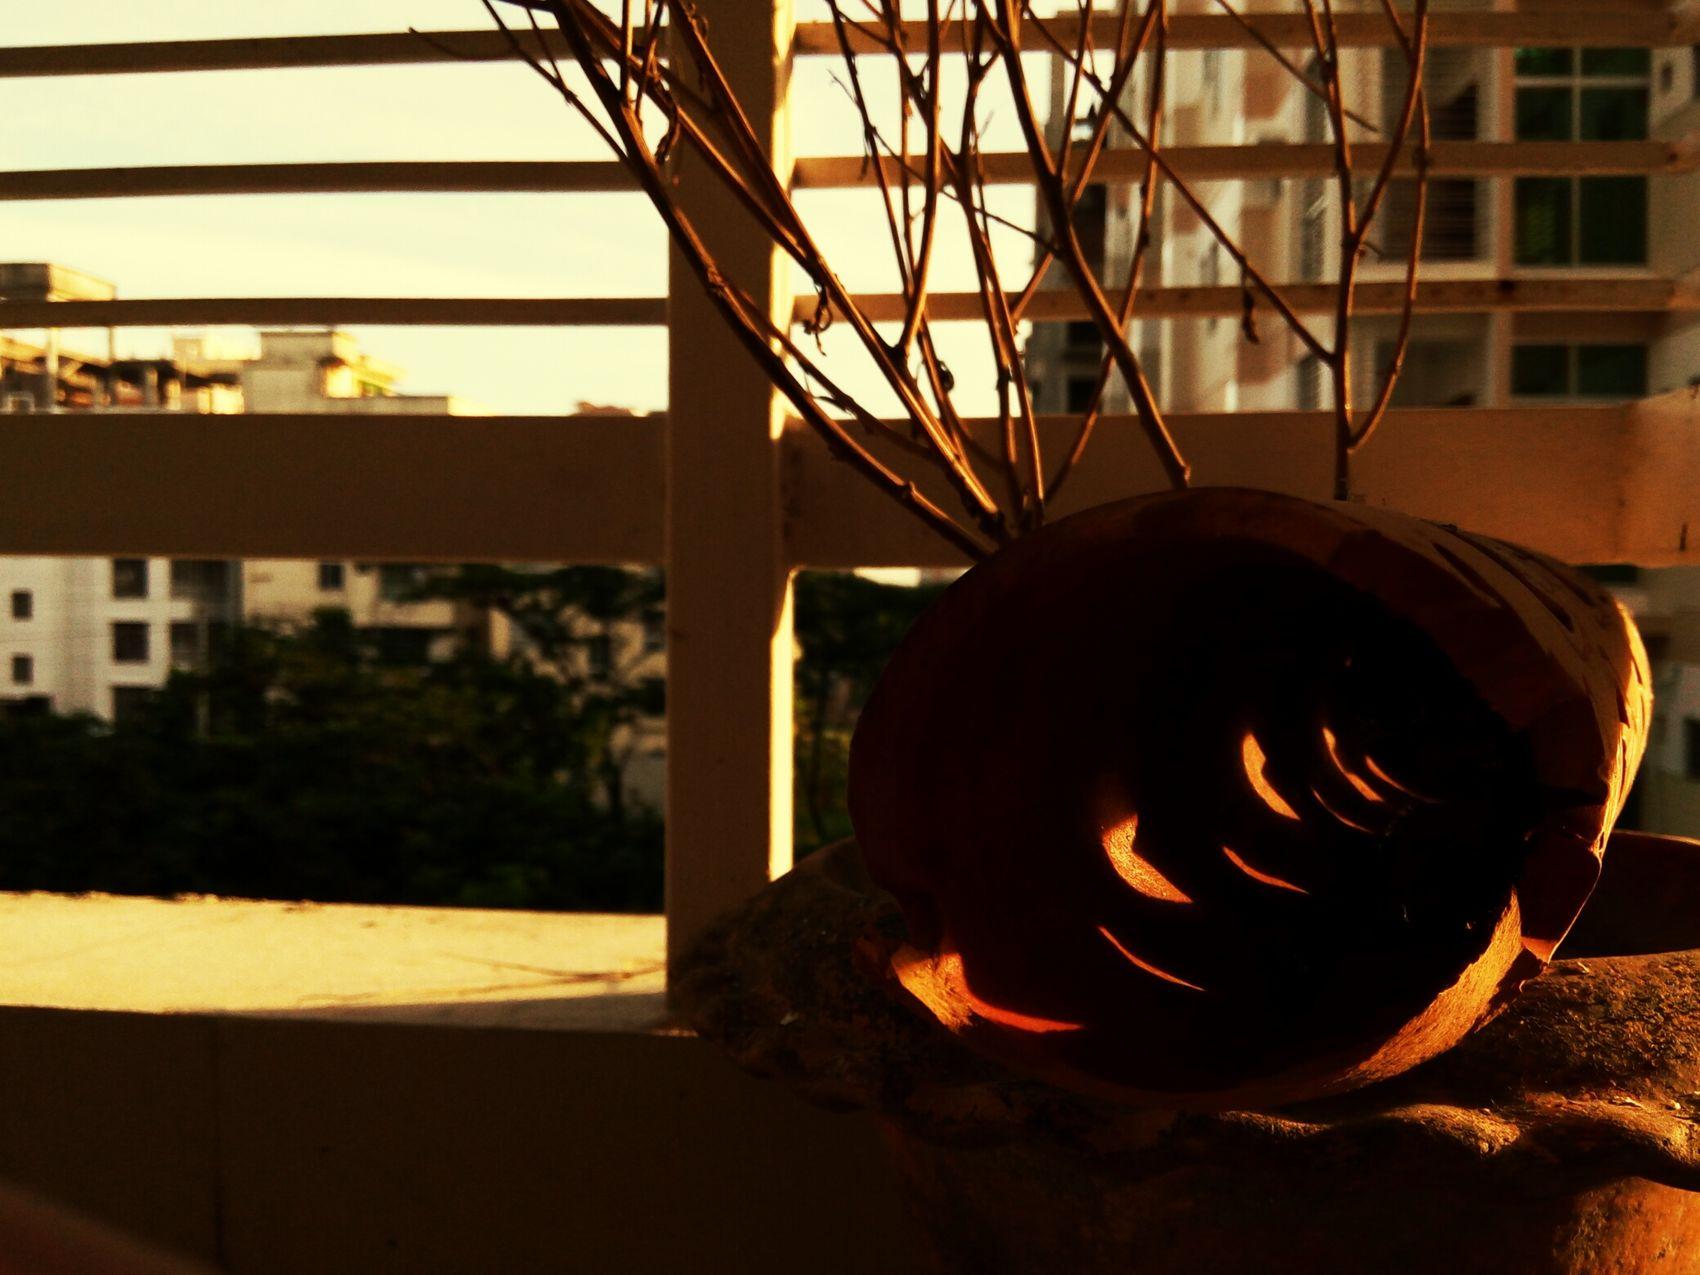 Toxic sunrise, dead night....shared coffee Sunrise Balcony Sunrise Dead Shrub Love ♥ Hate